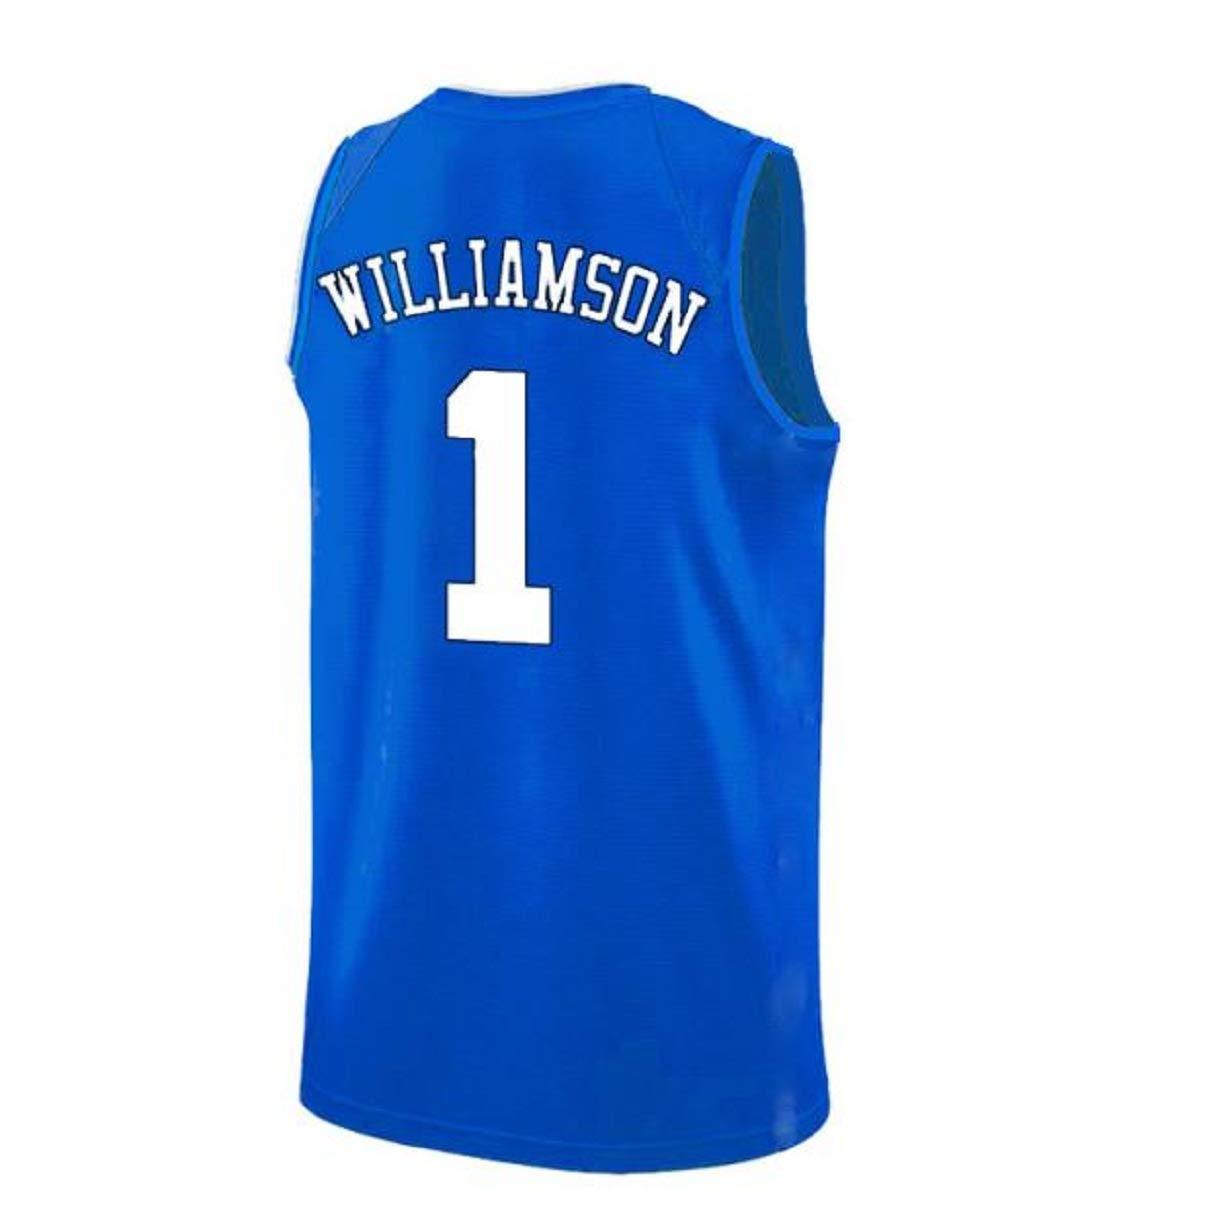 B07WM15M4R Mens Williamson Jersey Duke 1 Jerseys Adult Basketball University Zion Jersey Blue(S-XXL) 515v6C5U1OL